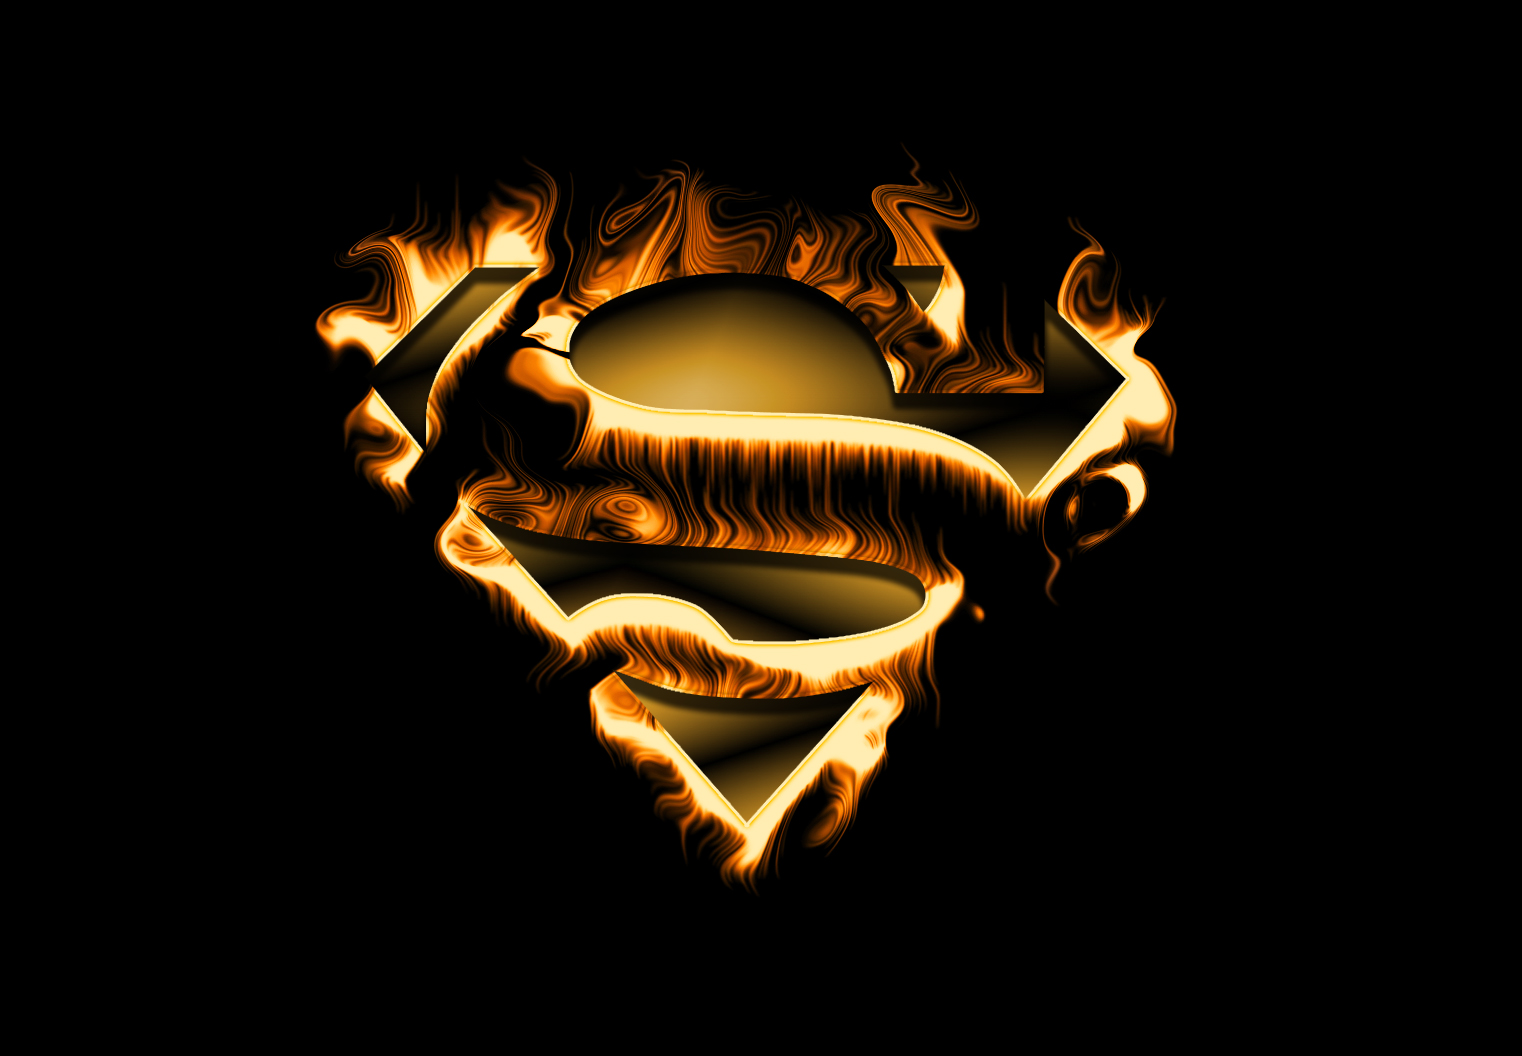 Fire Superman by Wayanoru 1522x1056